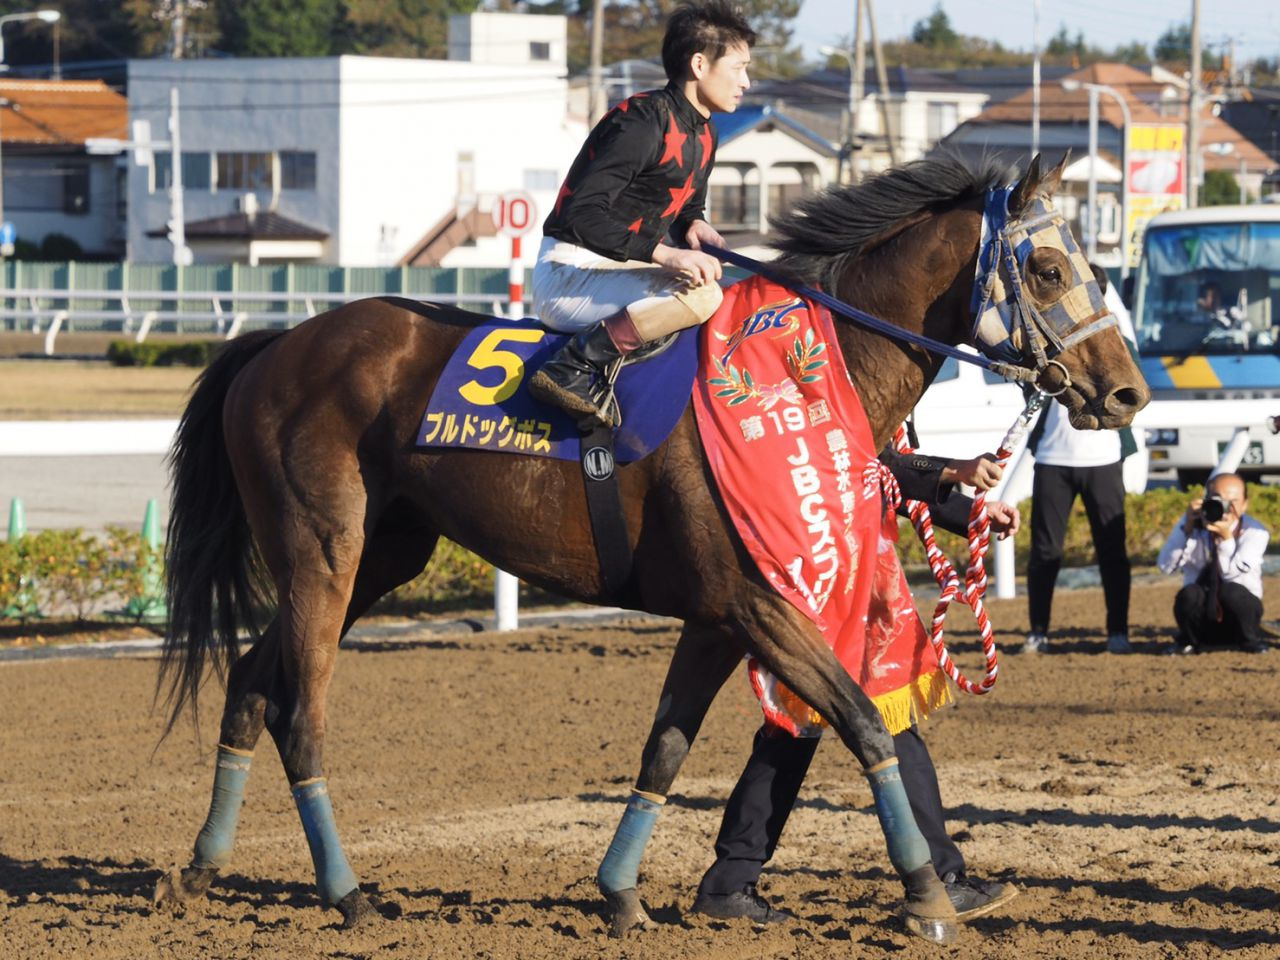 【JBCスプリント】御神本「菜七子ちゃんのG1を見届けたかったと思うんですけど…」浦和所属馬がV!